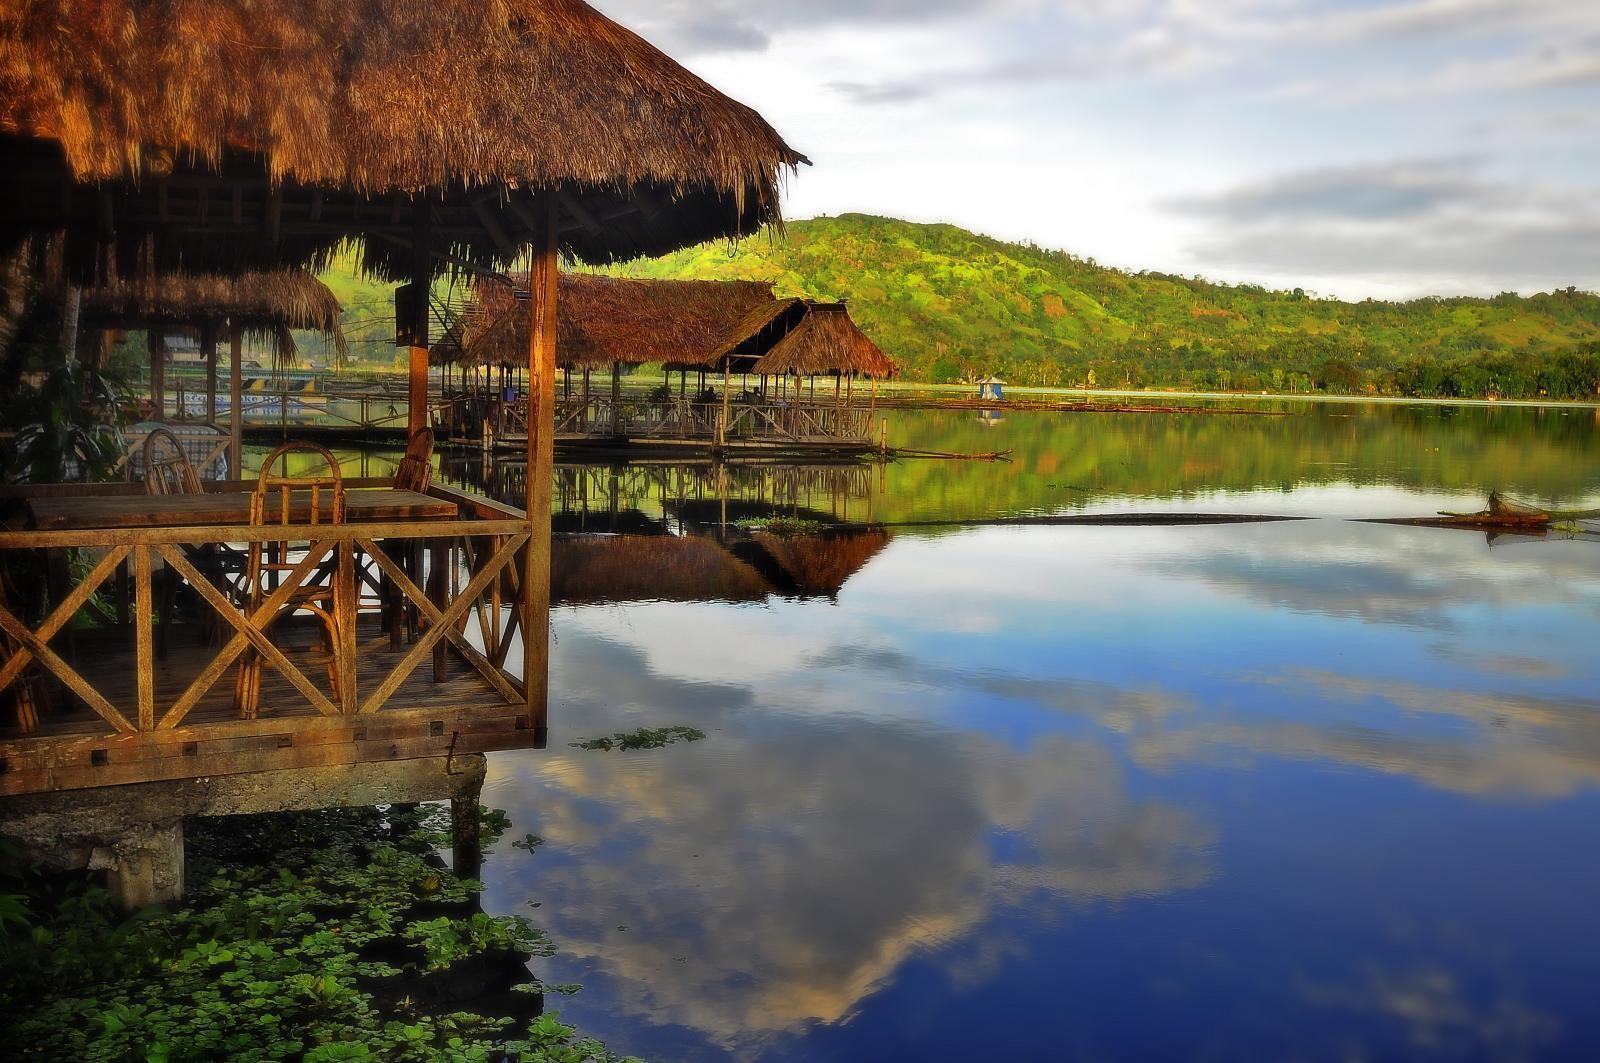 Lake sebu a nature lovers dream destination thecheapjerseys Gallery